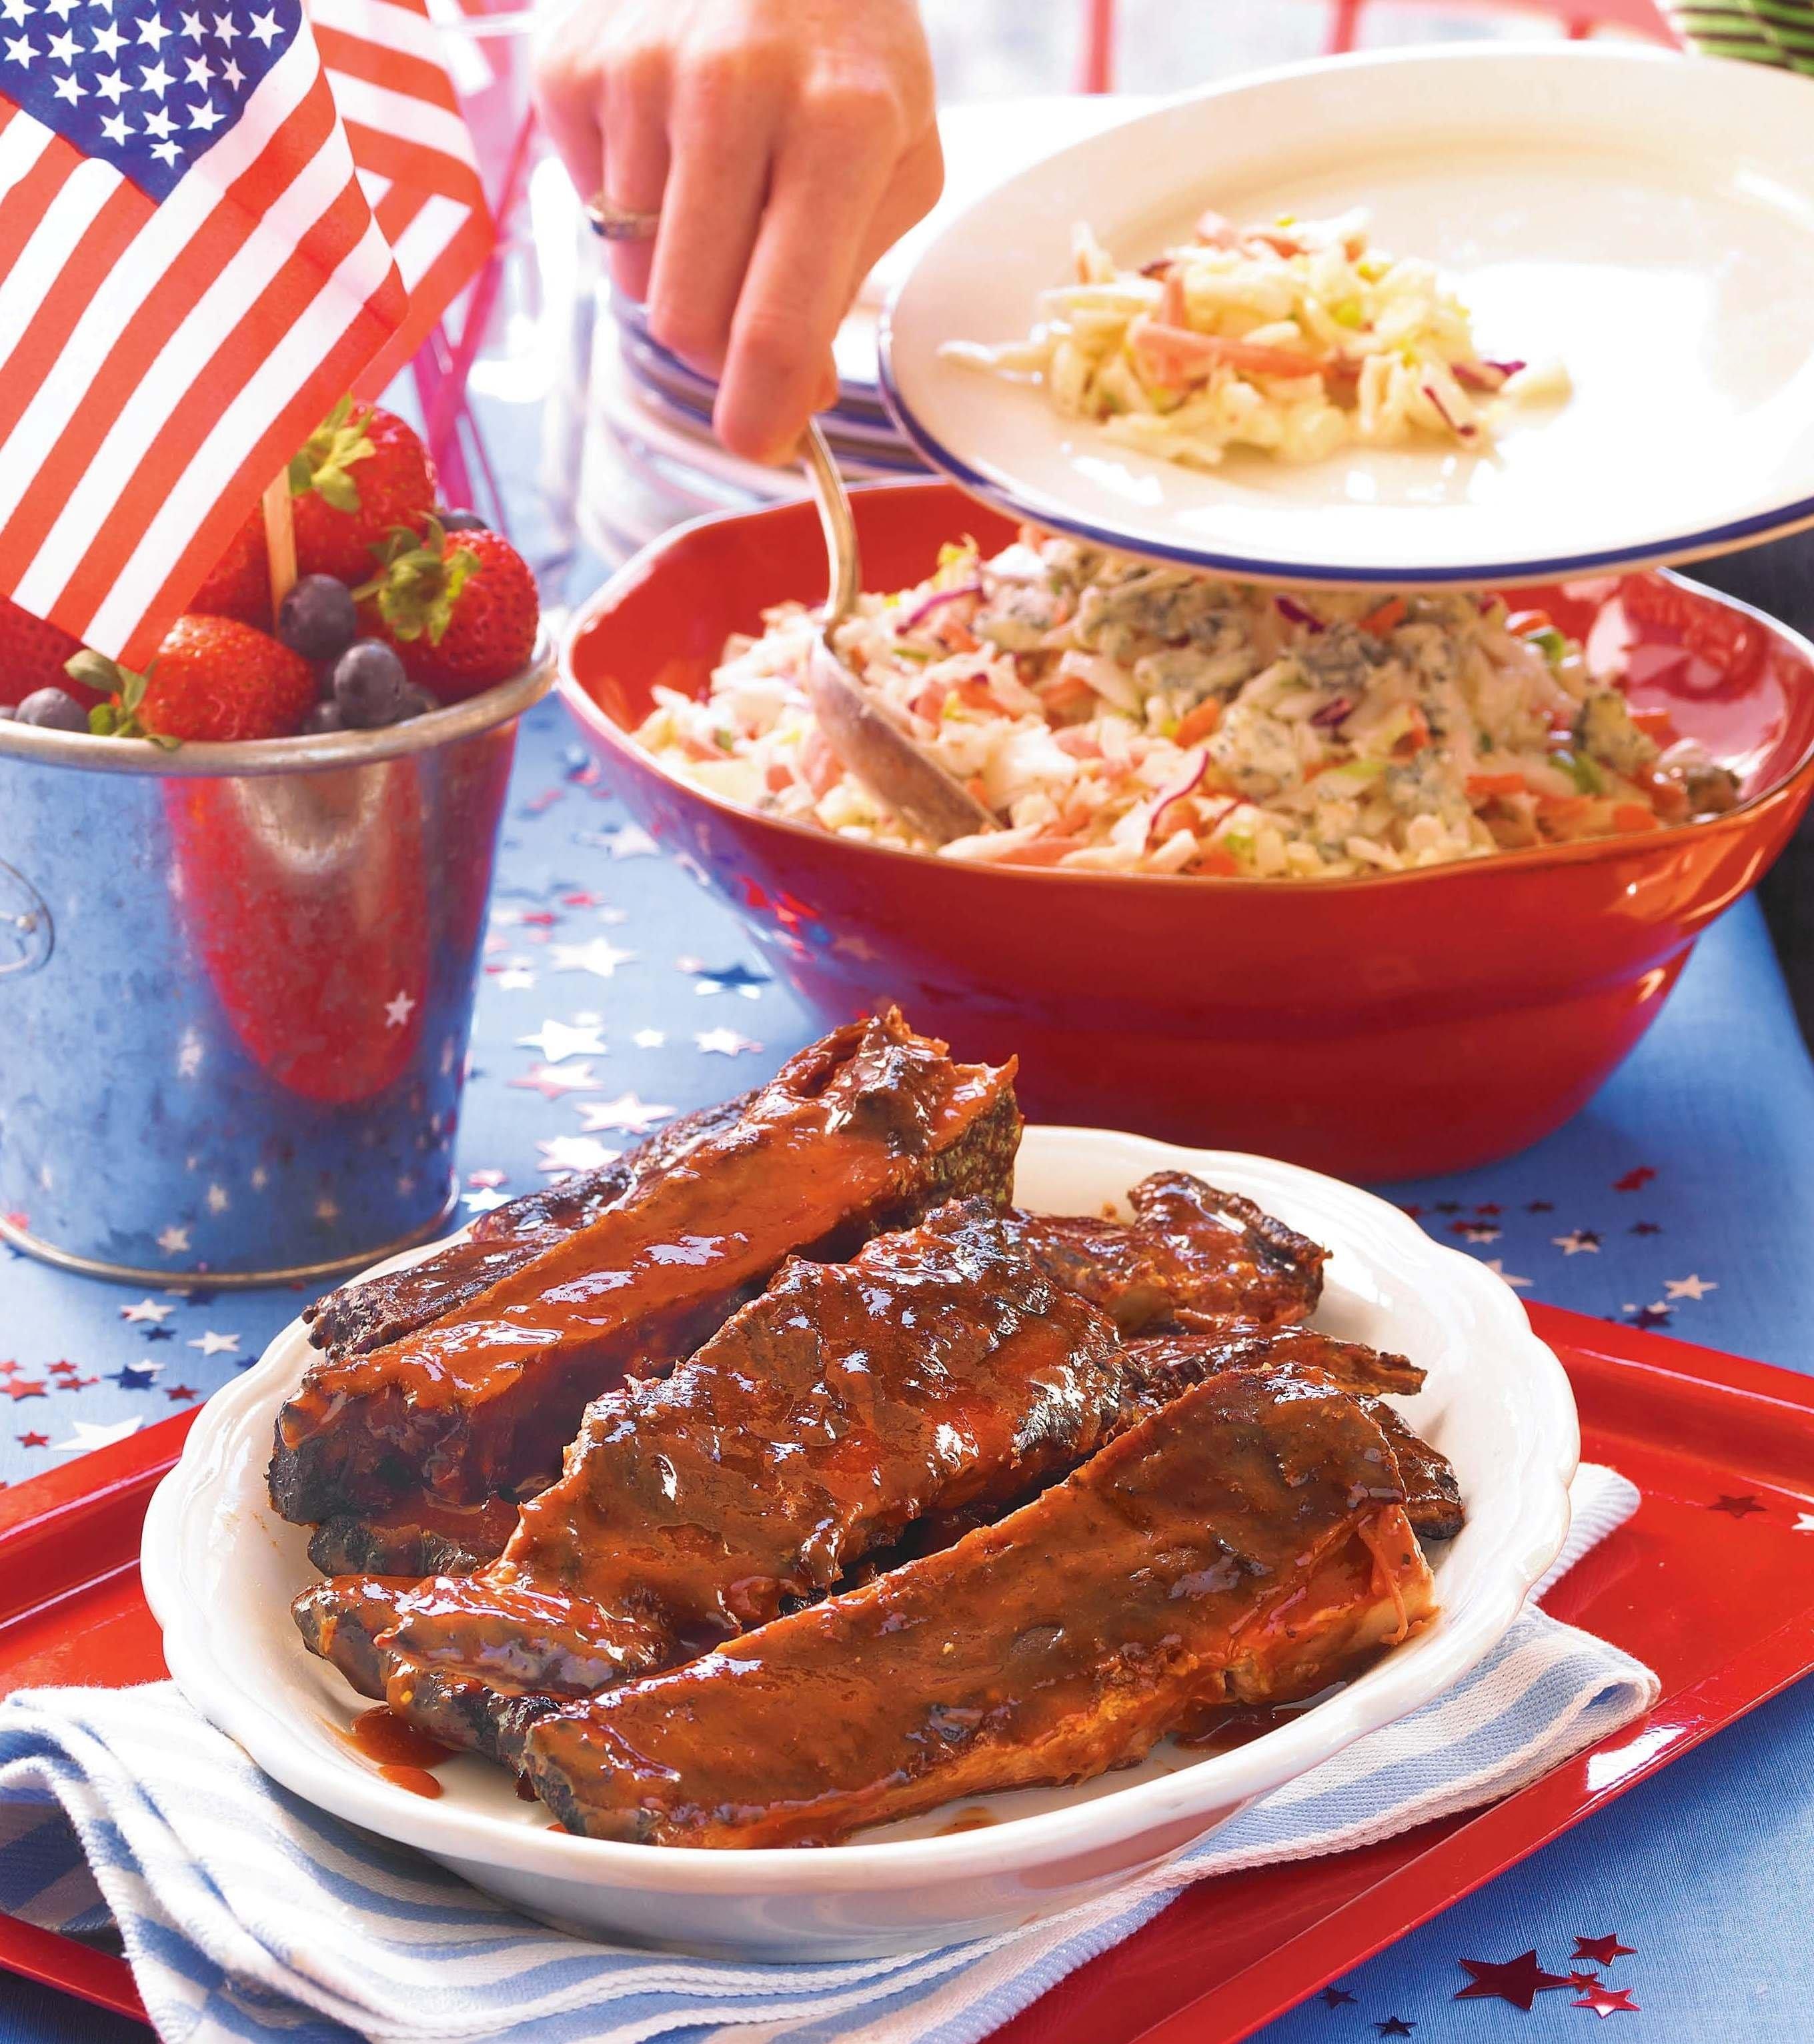 10 Beautiful Fourth Of July Menu Ideas family fun july 4 ideas 4th of july recipe ideas from the half 10 2021